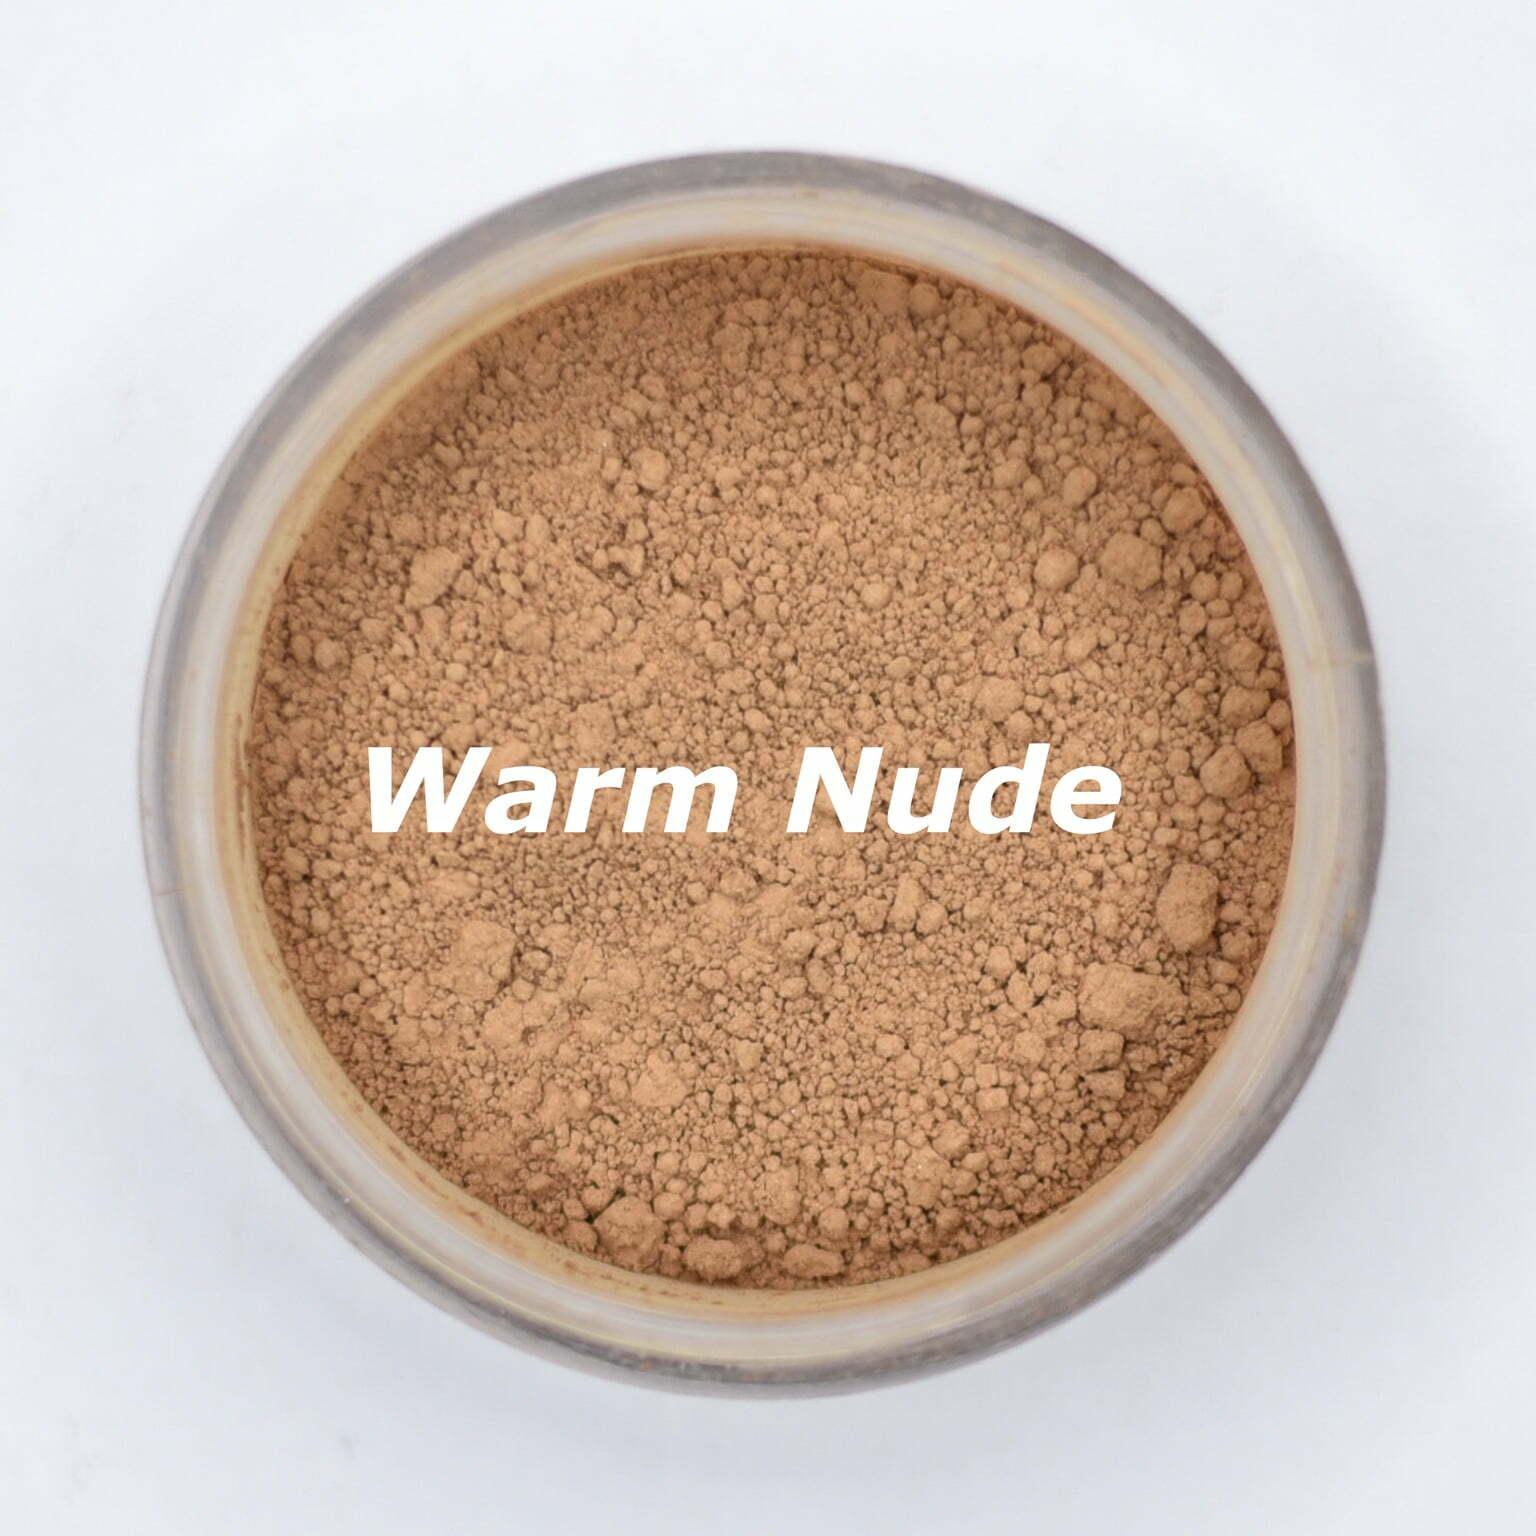 warm nude foundation shade